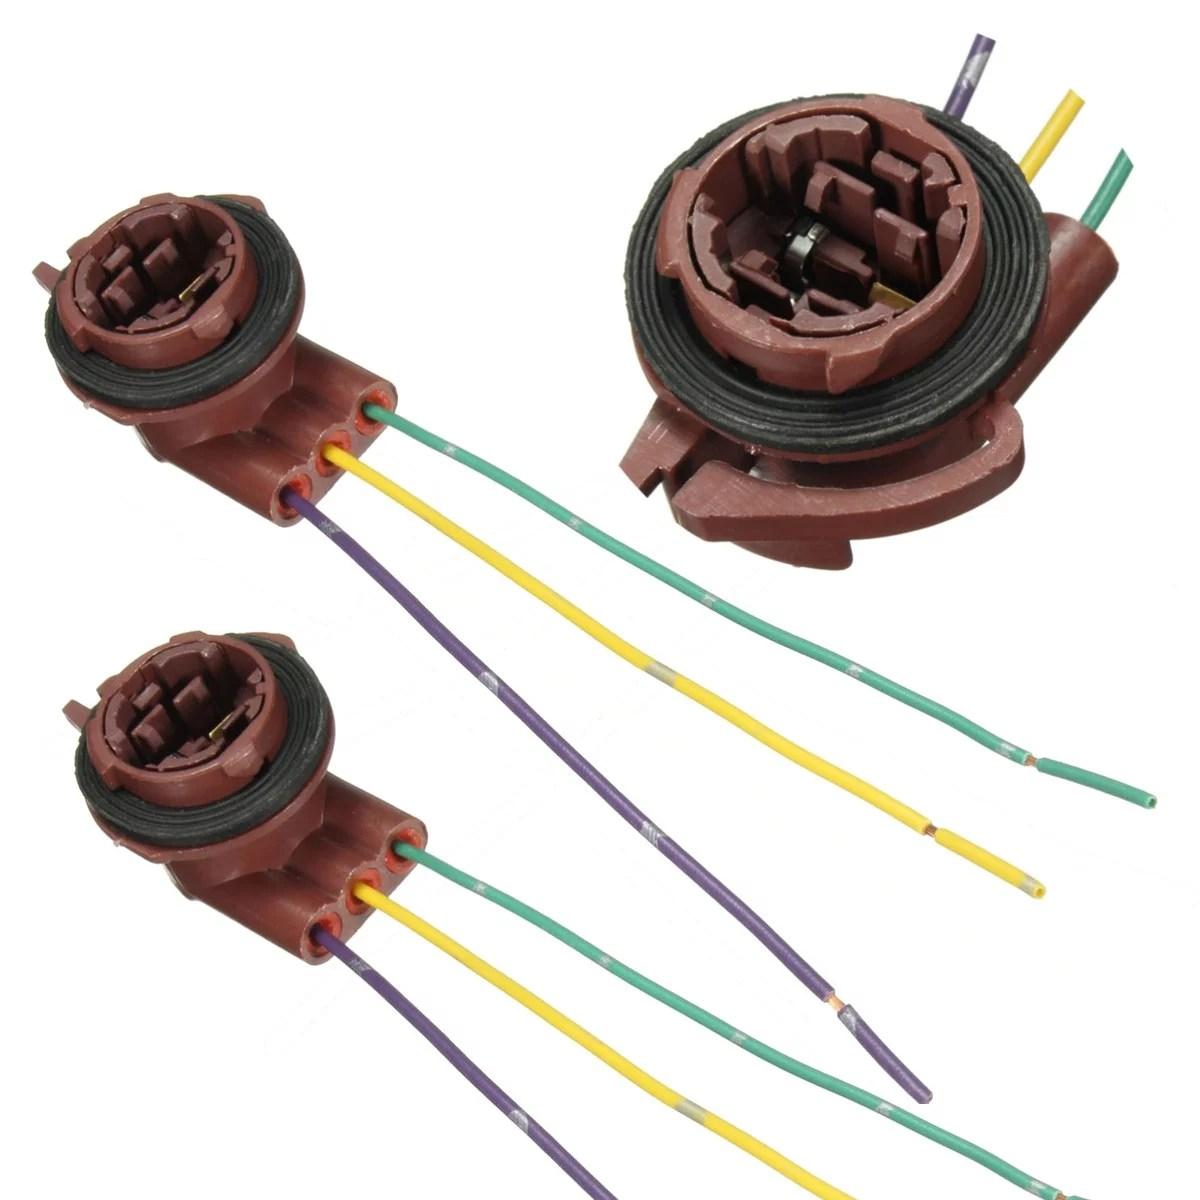 small resolution of matcc 2pcs 12v brake turn signal indicator light socket wiring ford 4000 tractor wiring diagram 12v plug wiring harness adapter